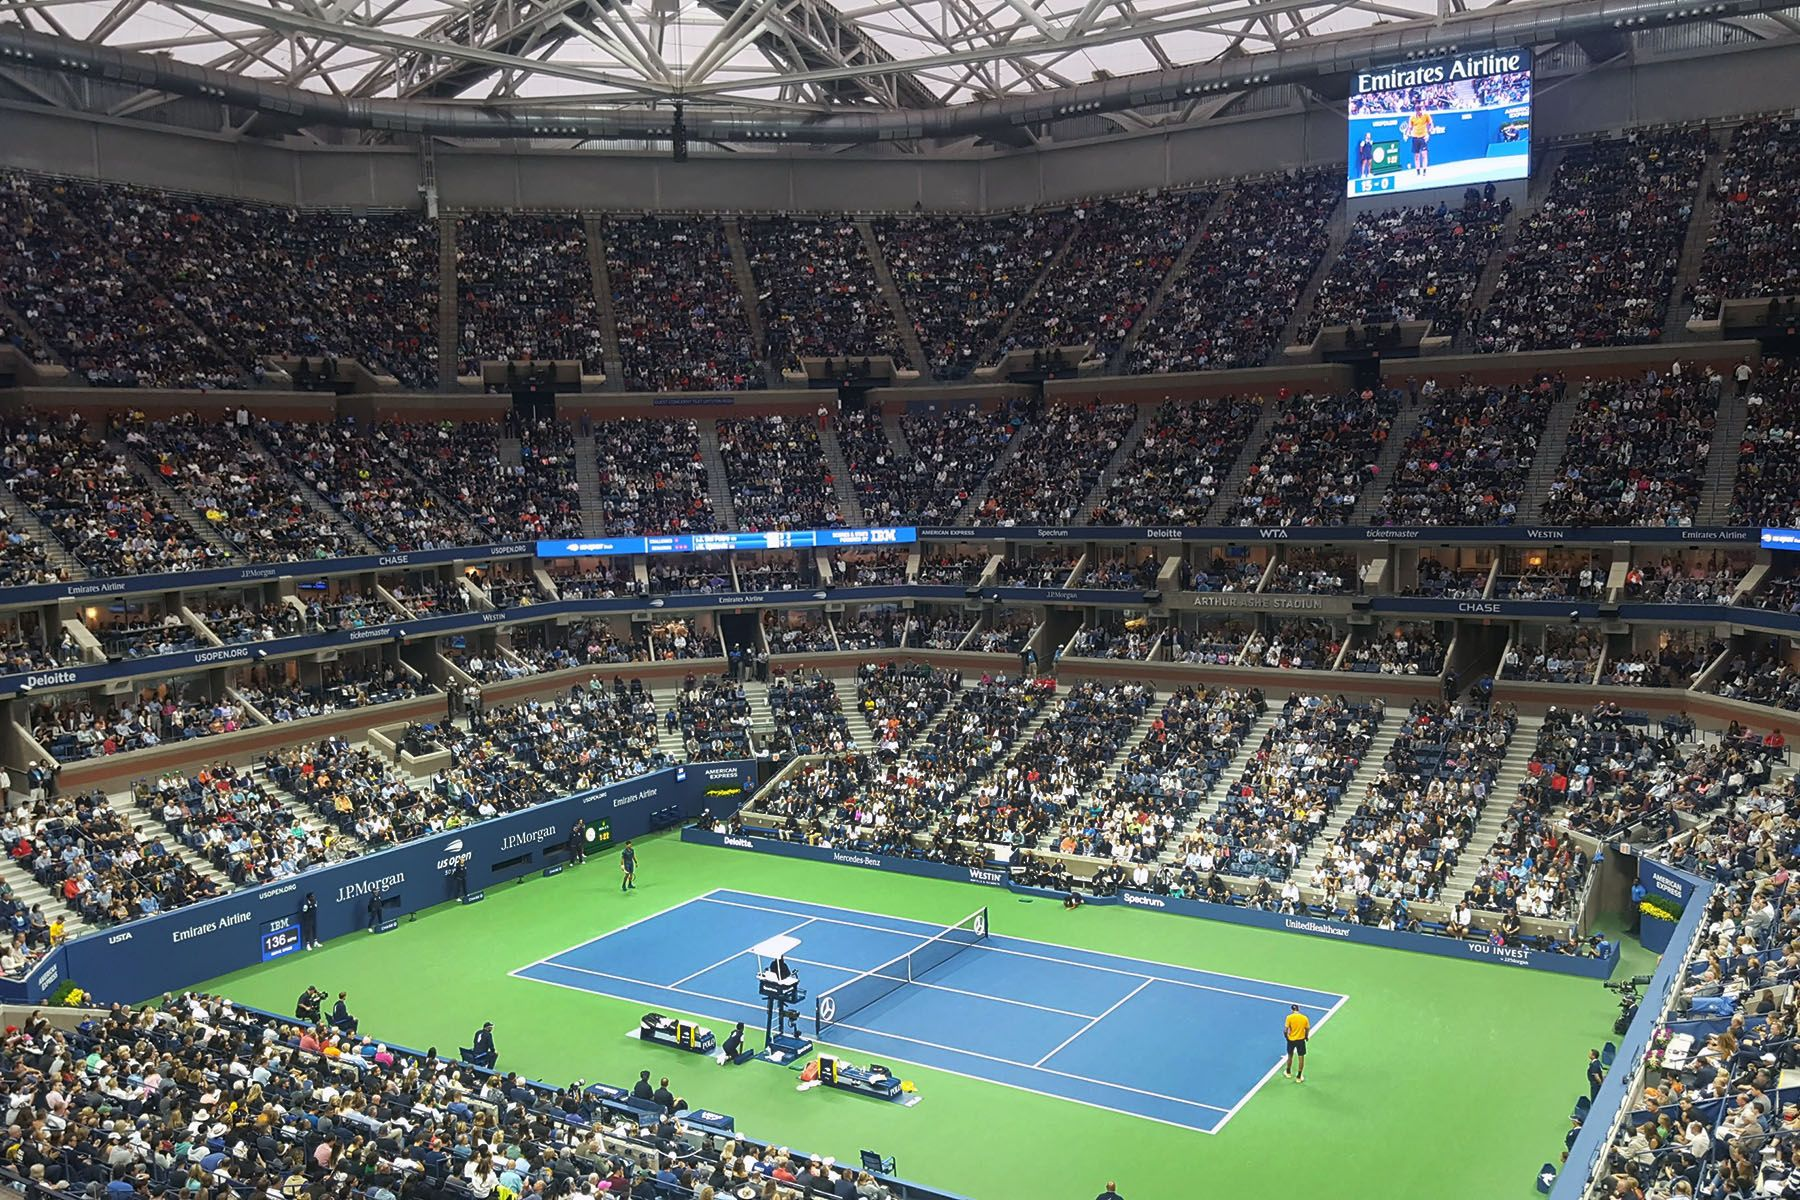 The U.S. Open finals on Sept 9, 2018, as Novak Djokovic bested Juan del Potro.